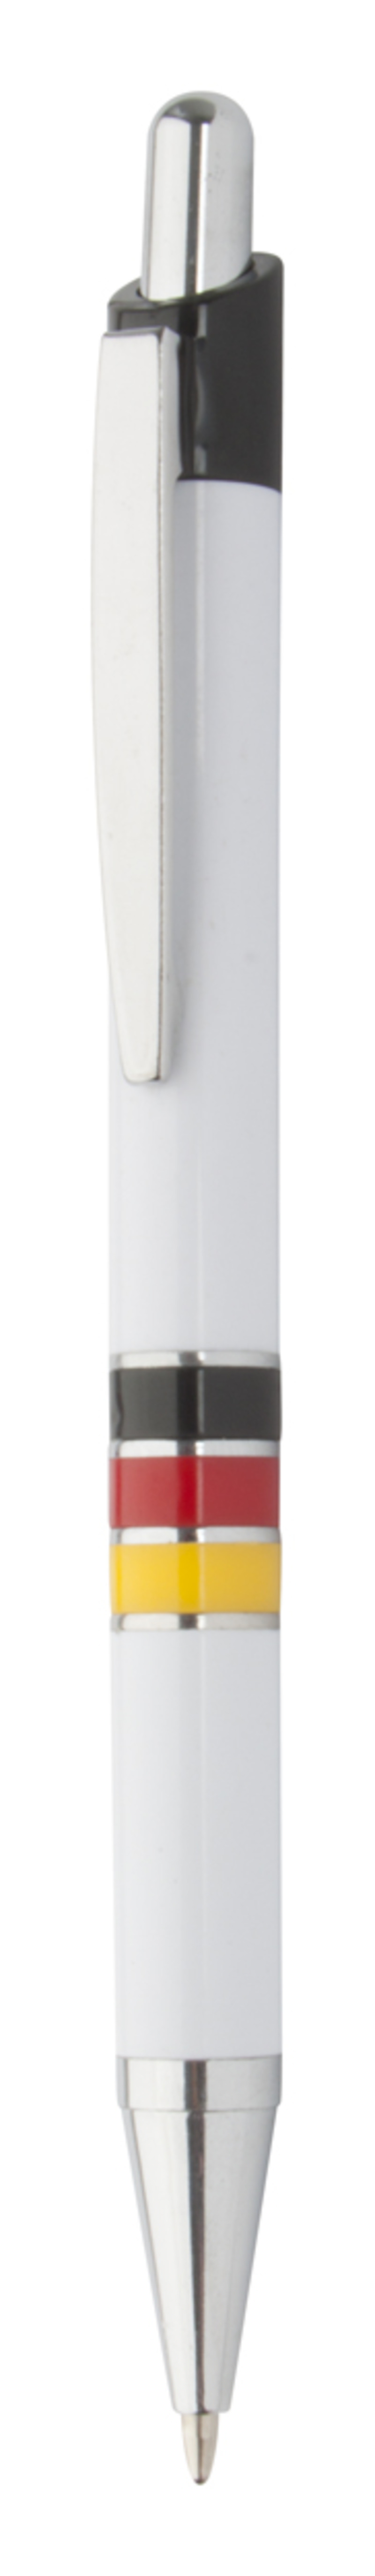 National ballpoint pen